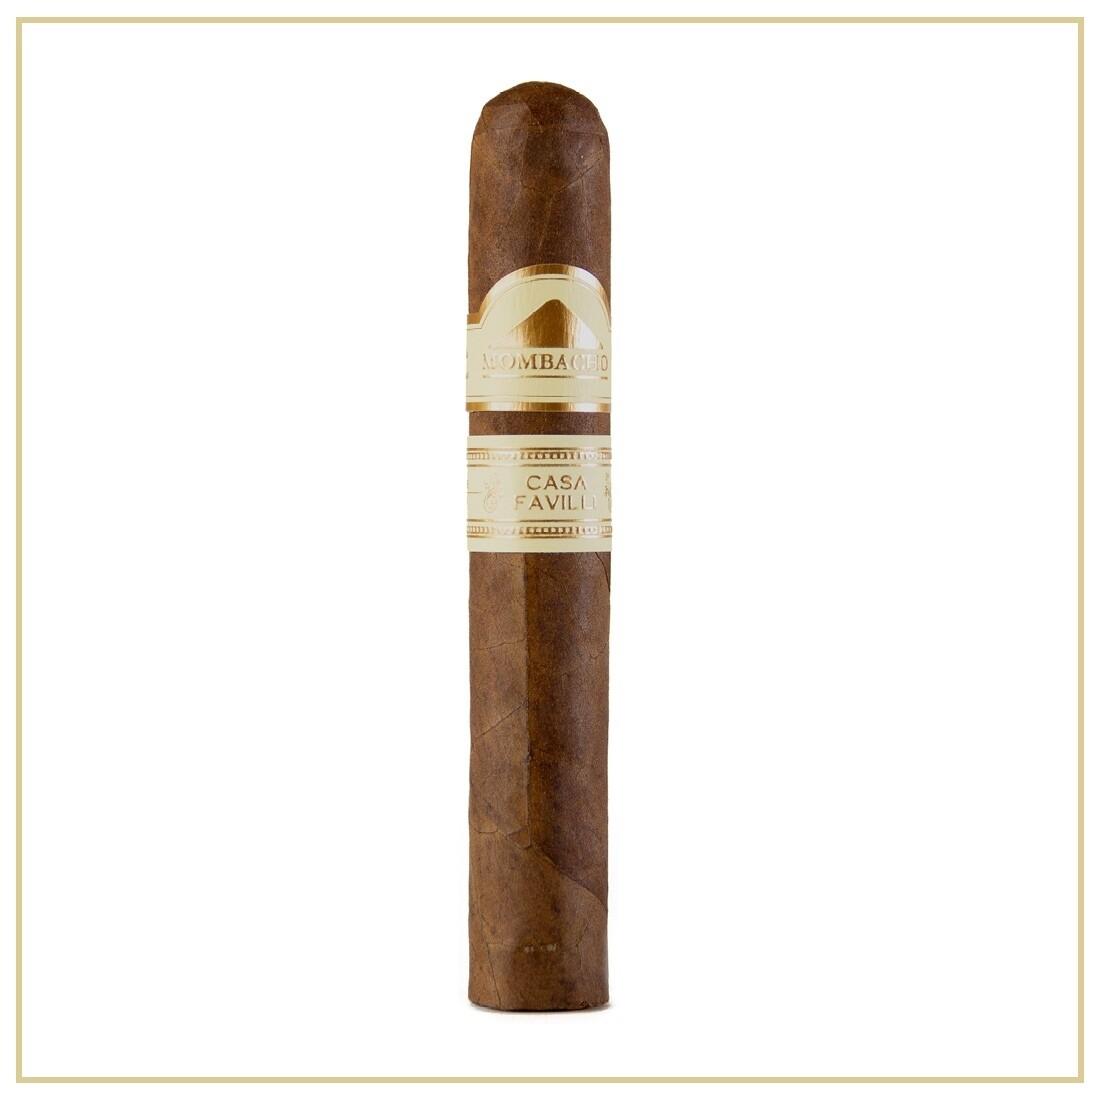 Mombacho Casa Favilli Robusto 5 x 50 Single Cigar